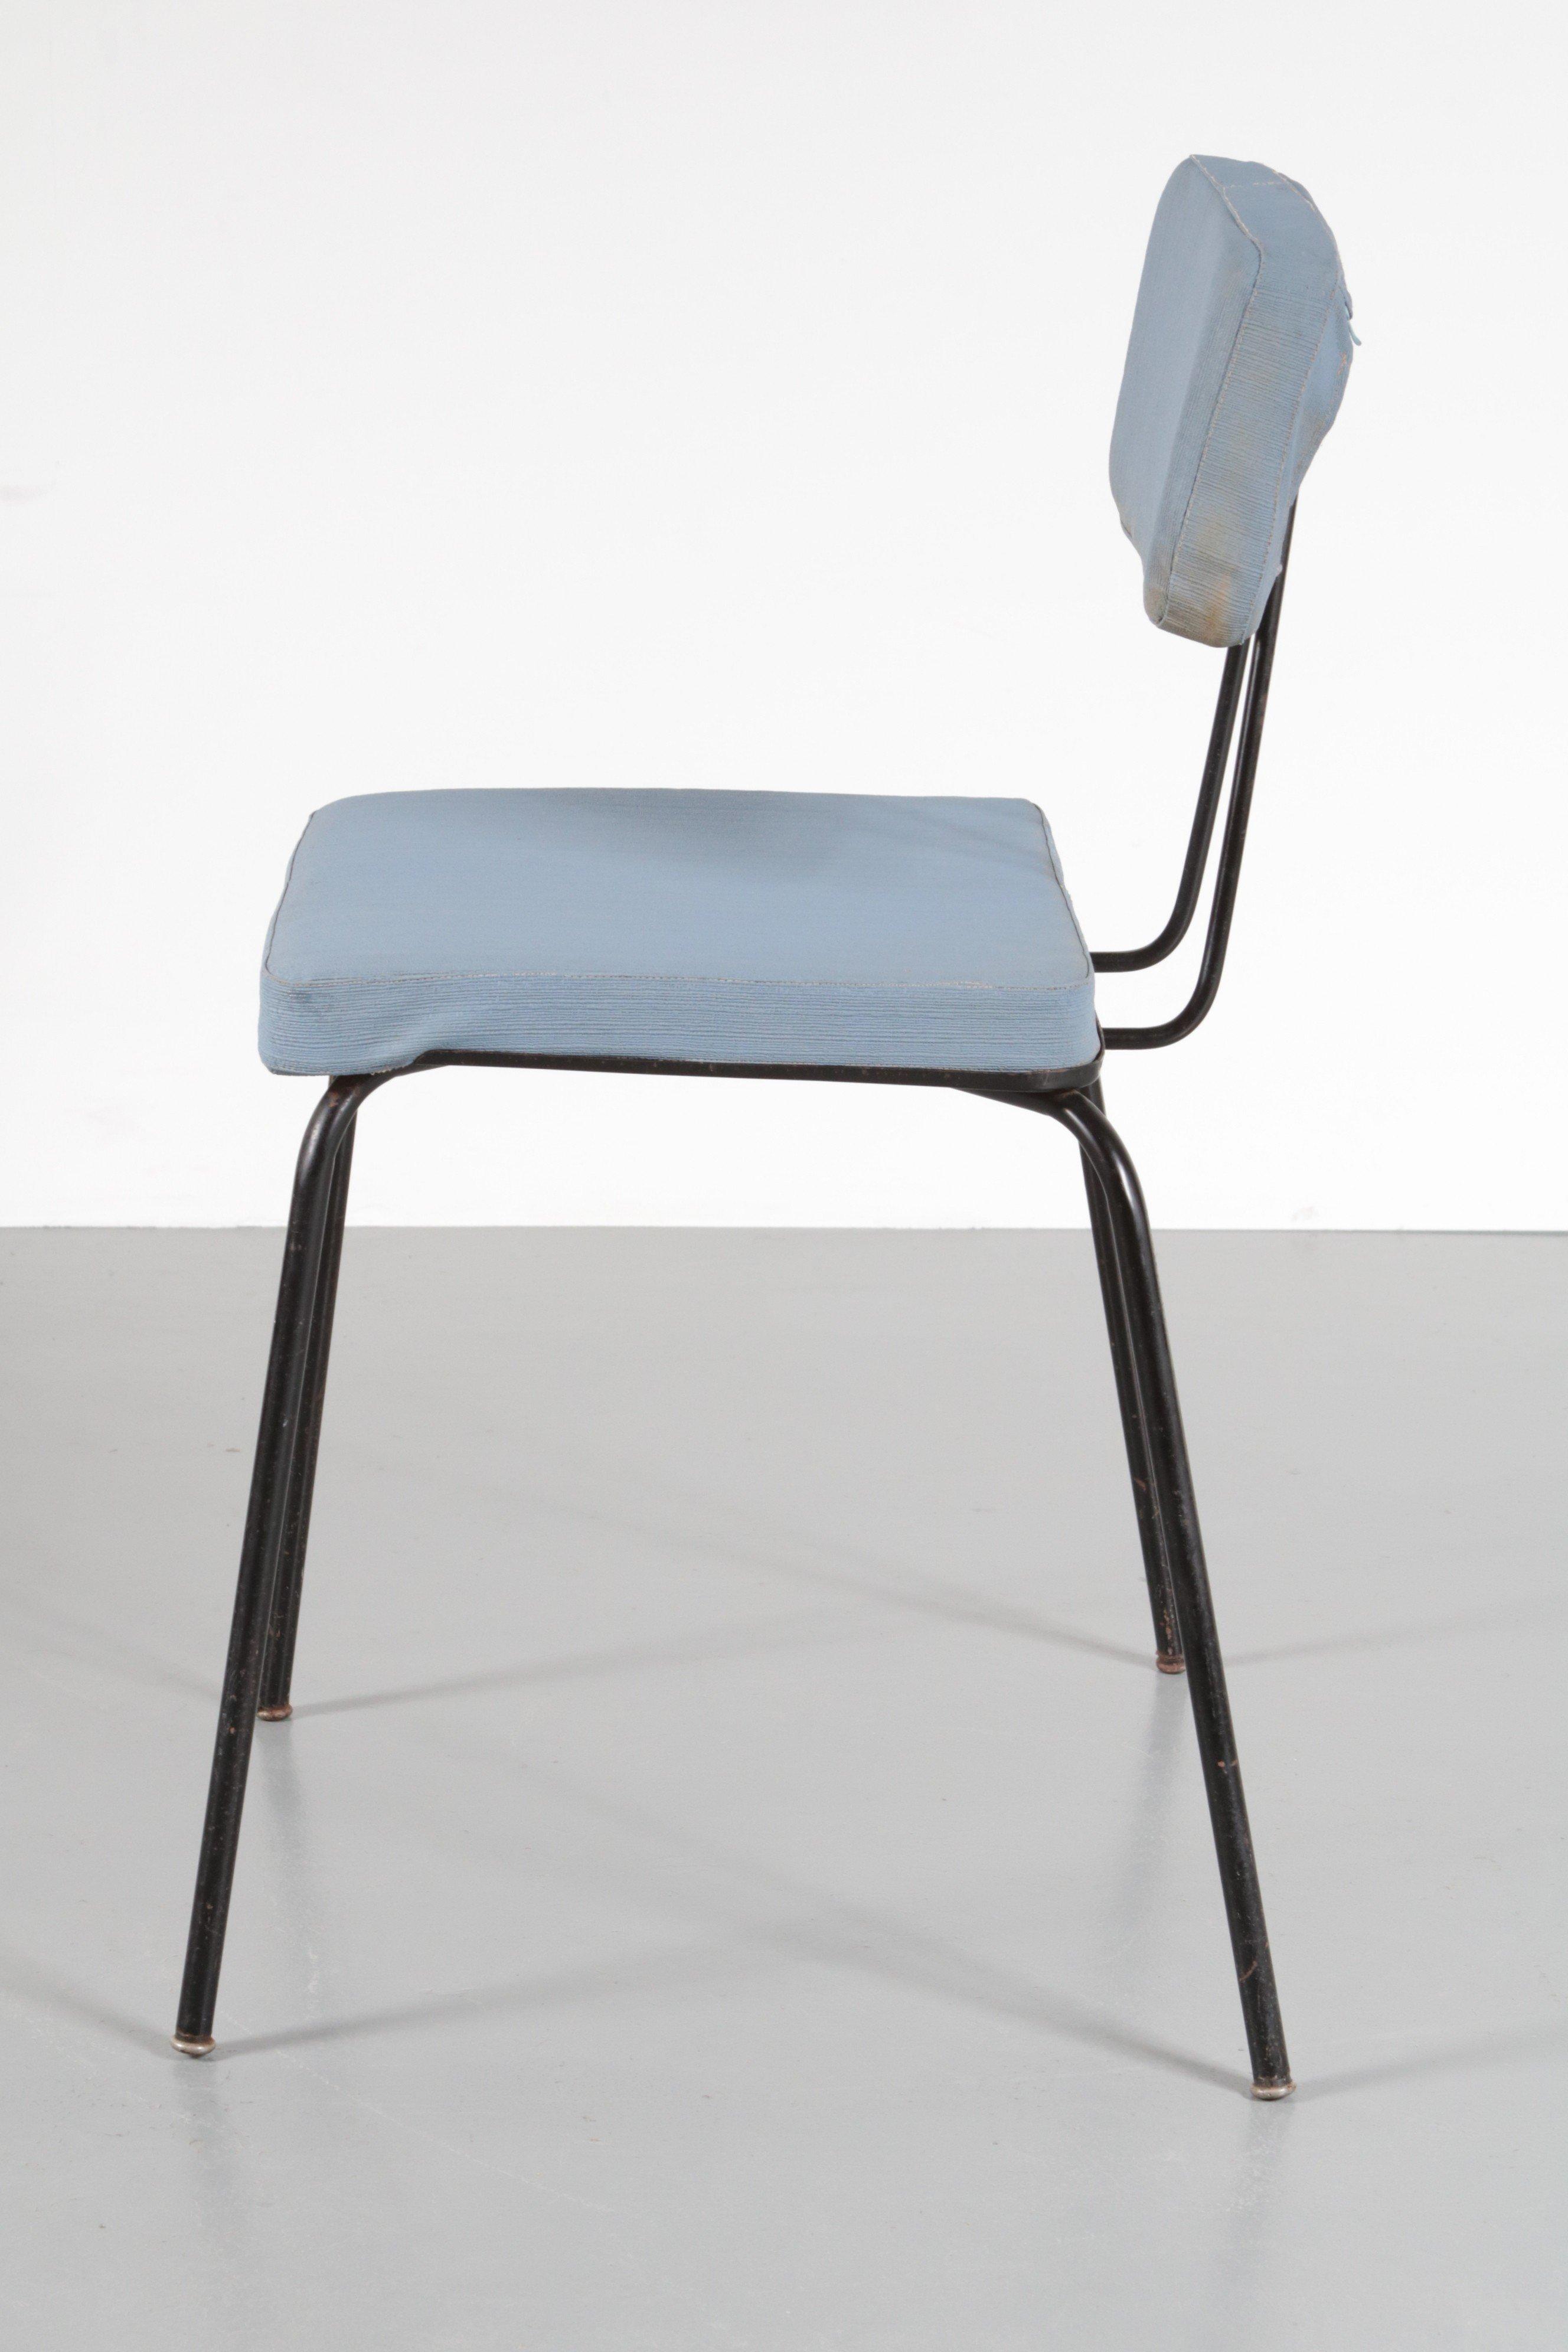 Minimalist Desk Chair By Studio BBPR